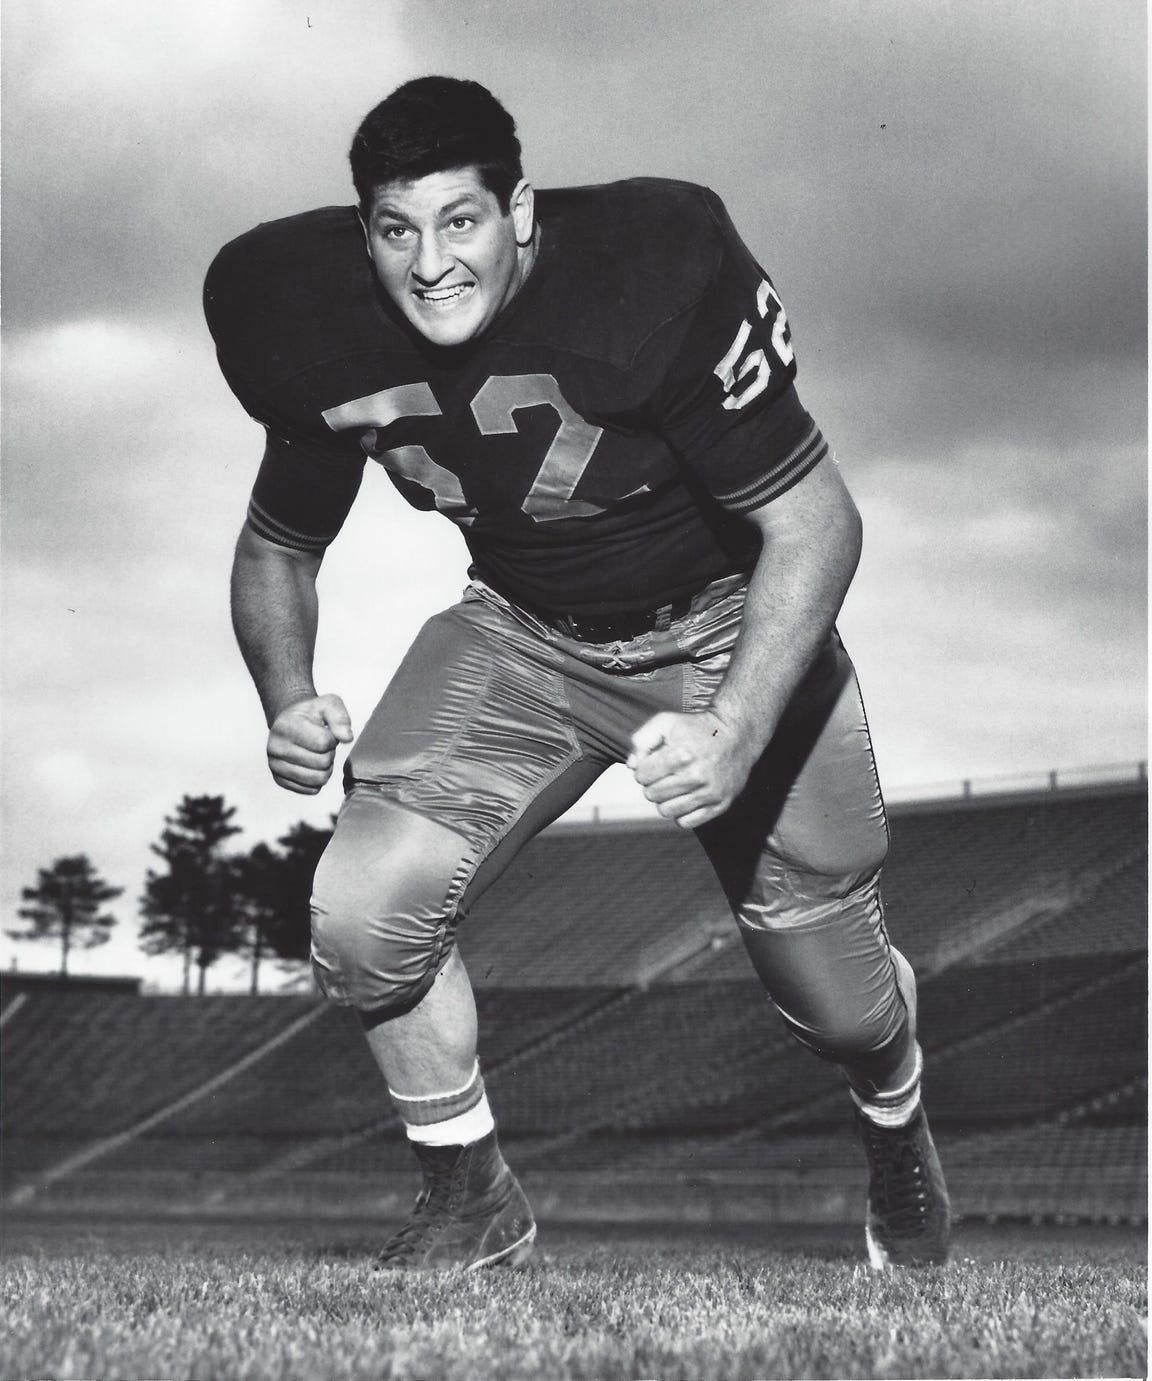 Purdue linebacker Jack Calcaterra